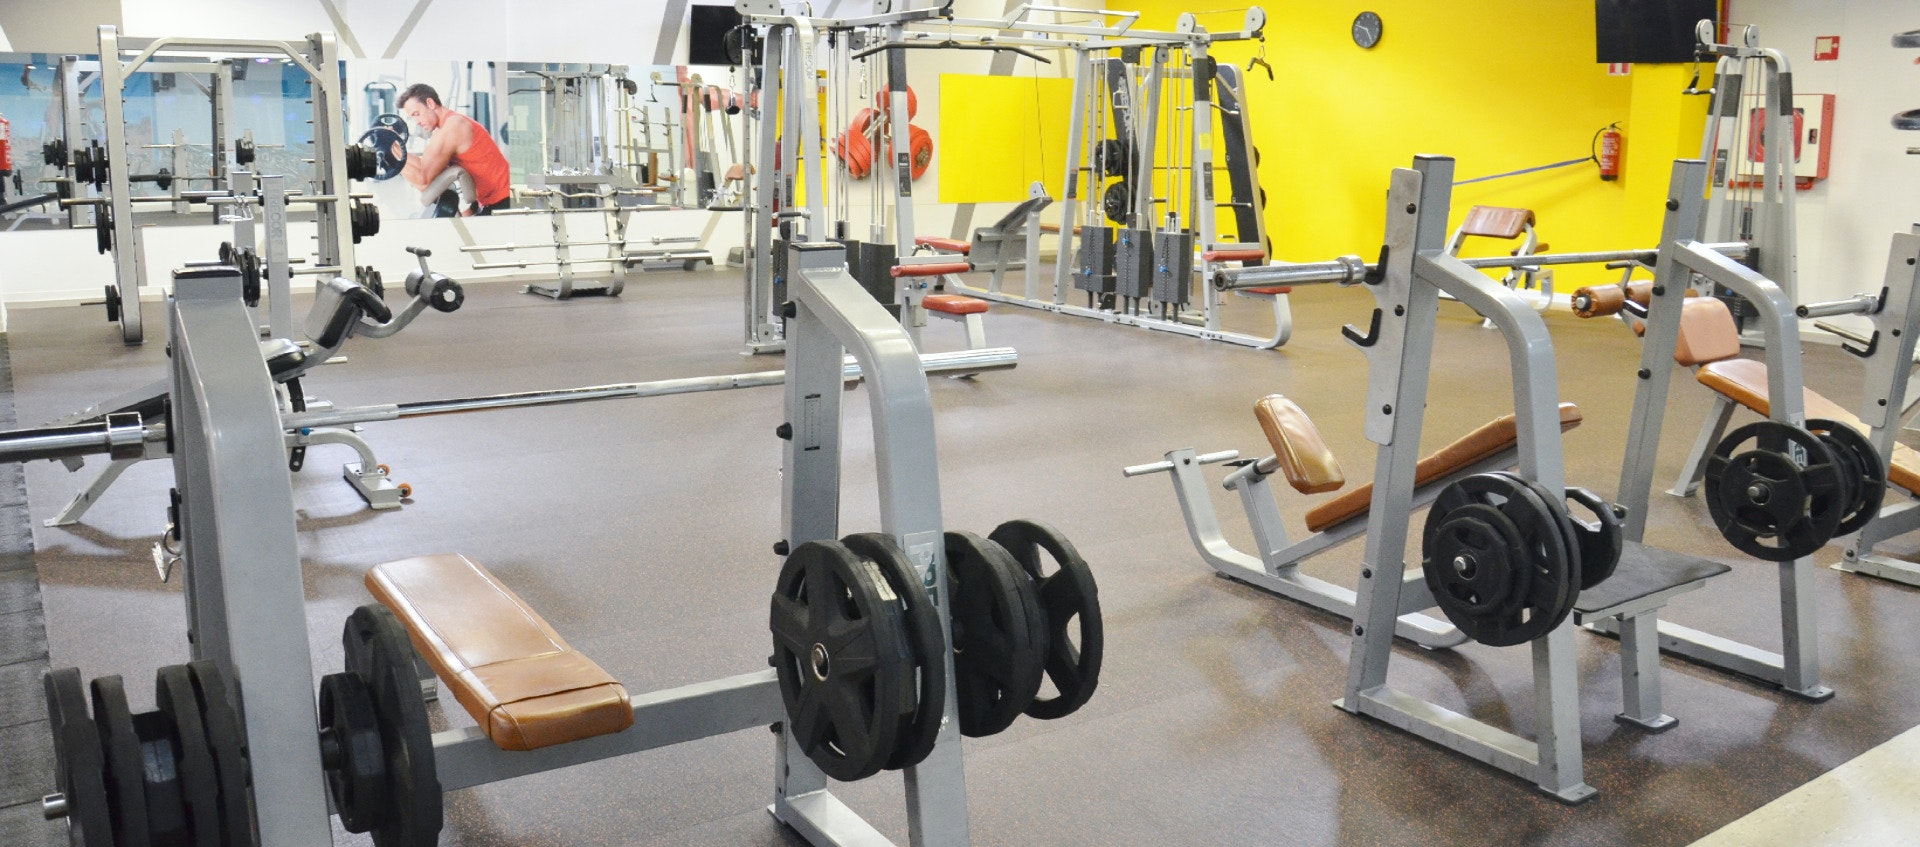 Foto 1 Oferta I-Fitness Las Palmas de Gran Canaria Las Palmas de Gran Canaria {2} - GymForLess